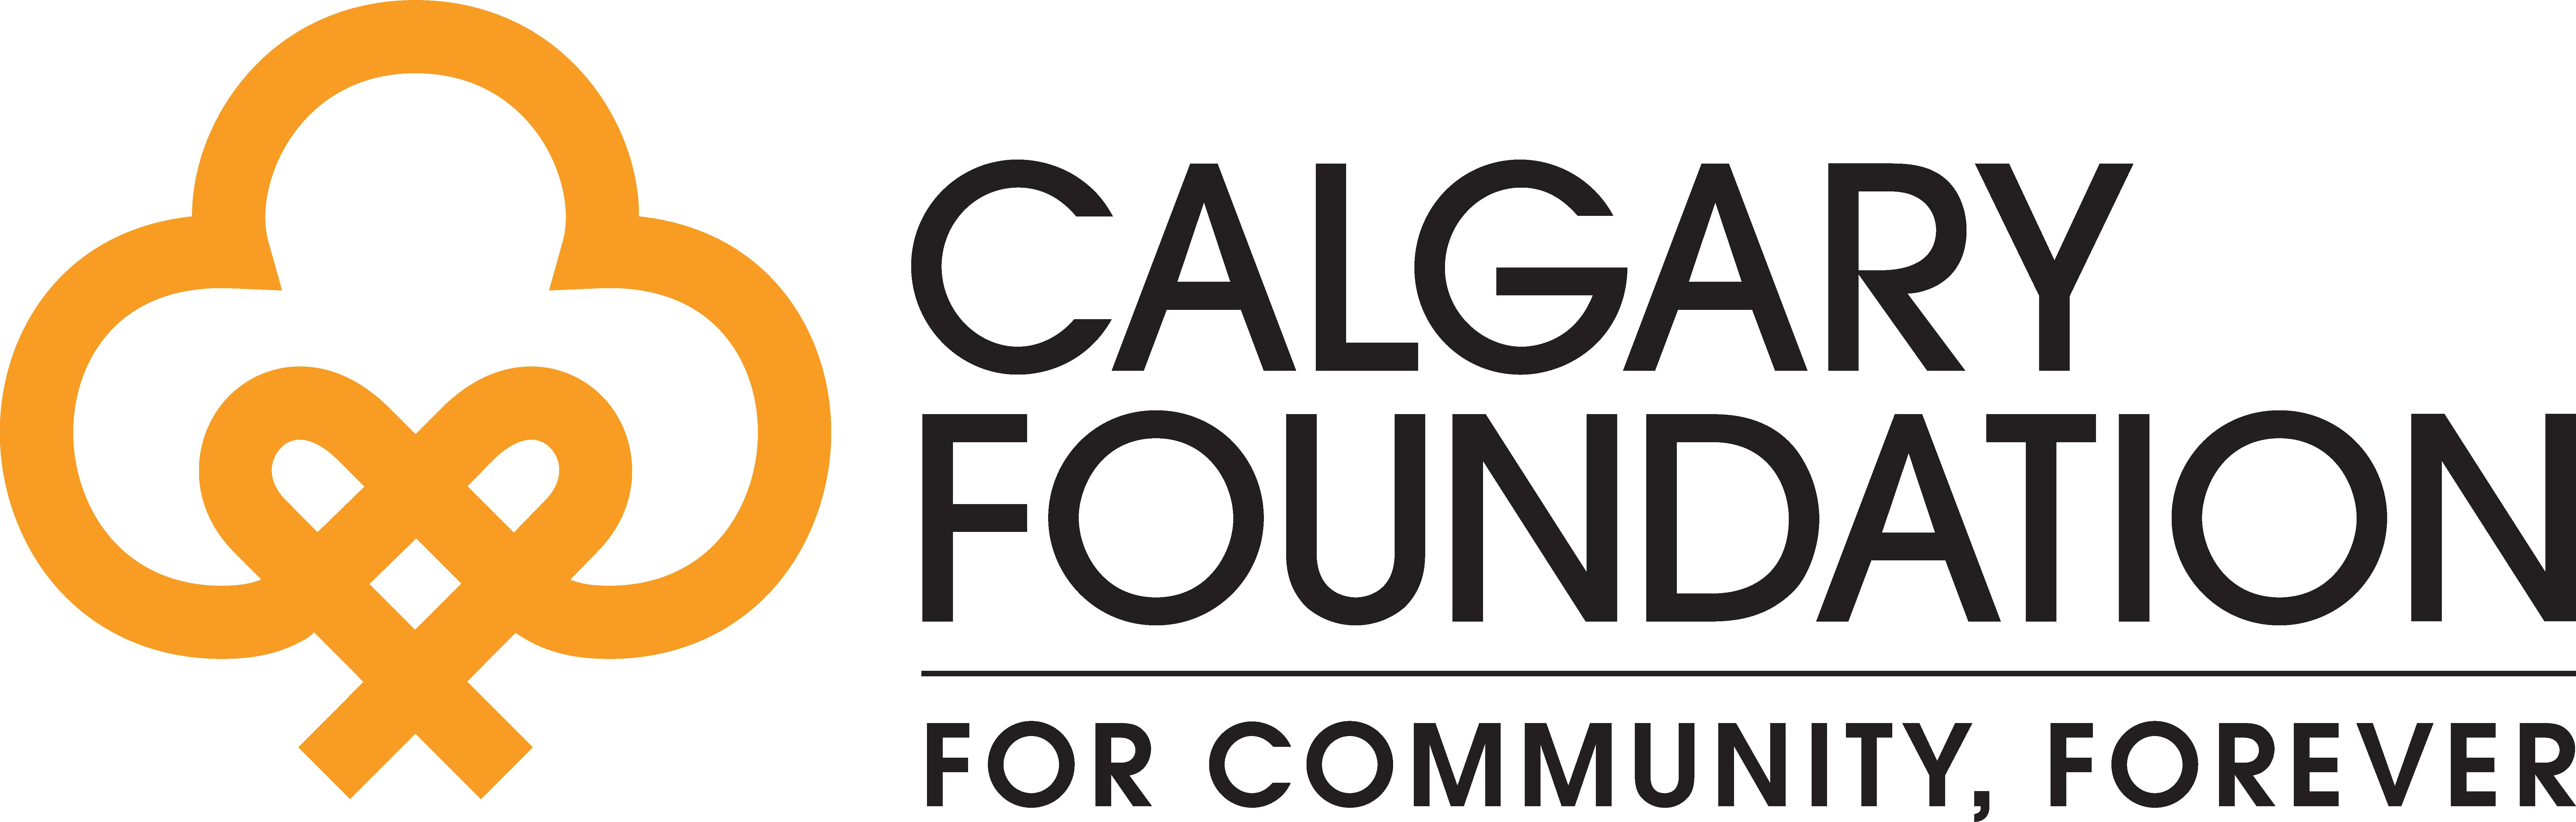 Calgary Foundation logo